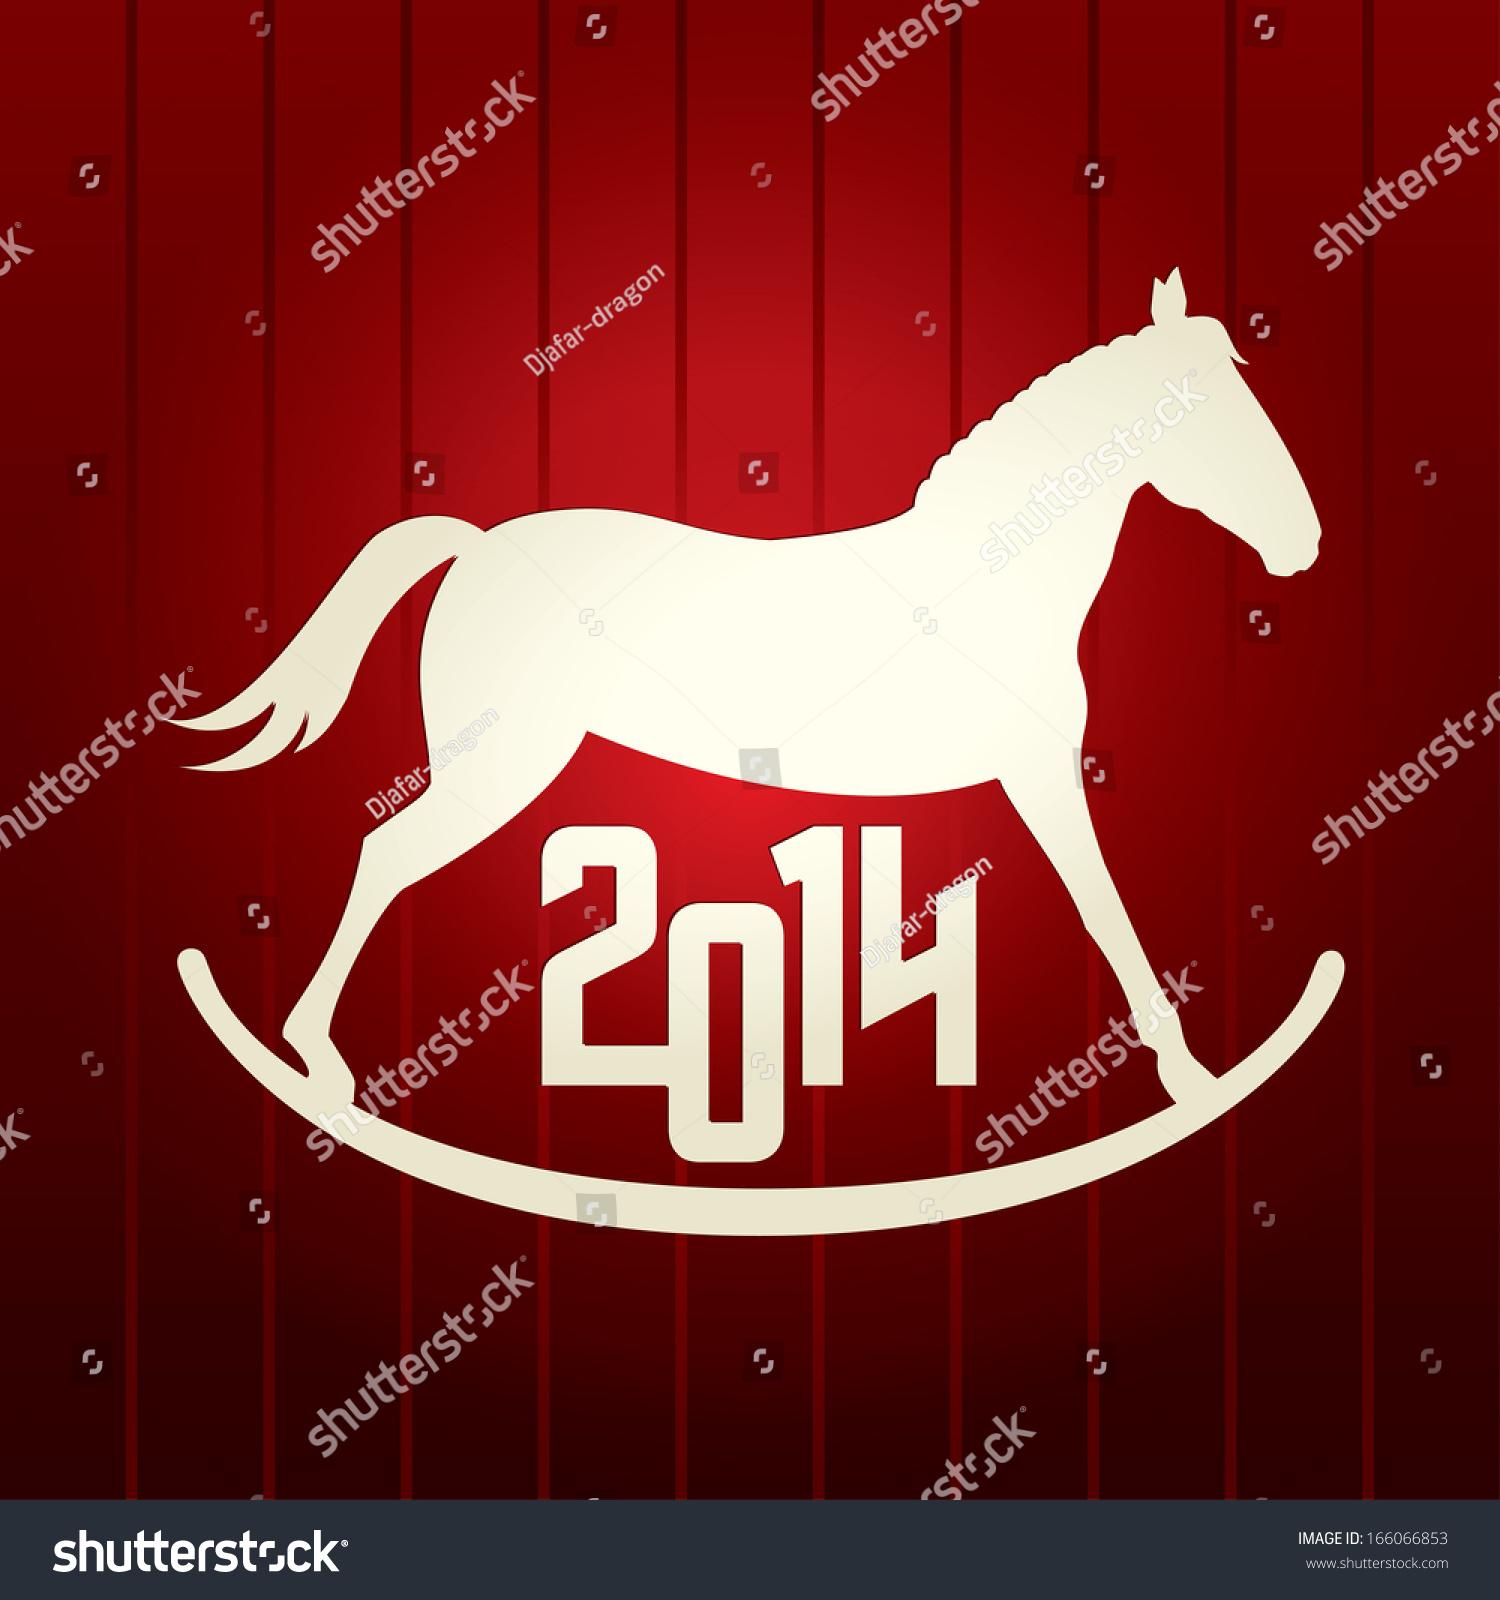 New year vector red background horse stock vector 166066853 new year vector red background horse symbol of 2014 buycottarizona